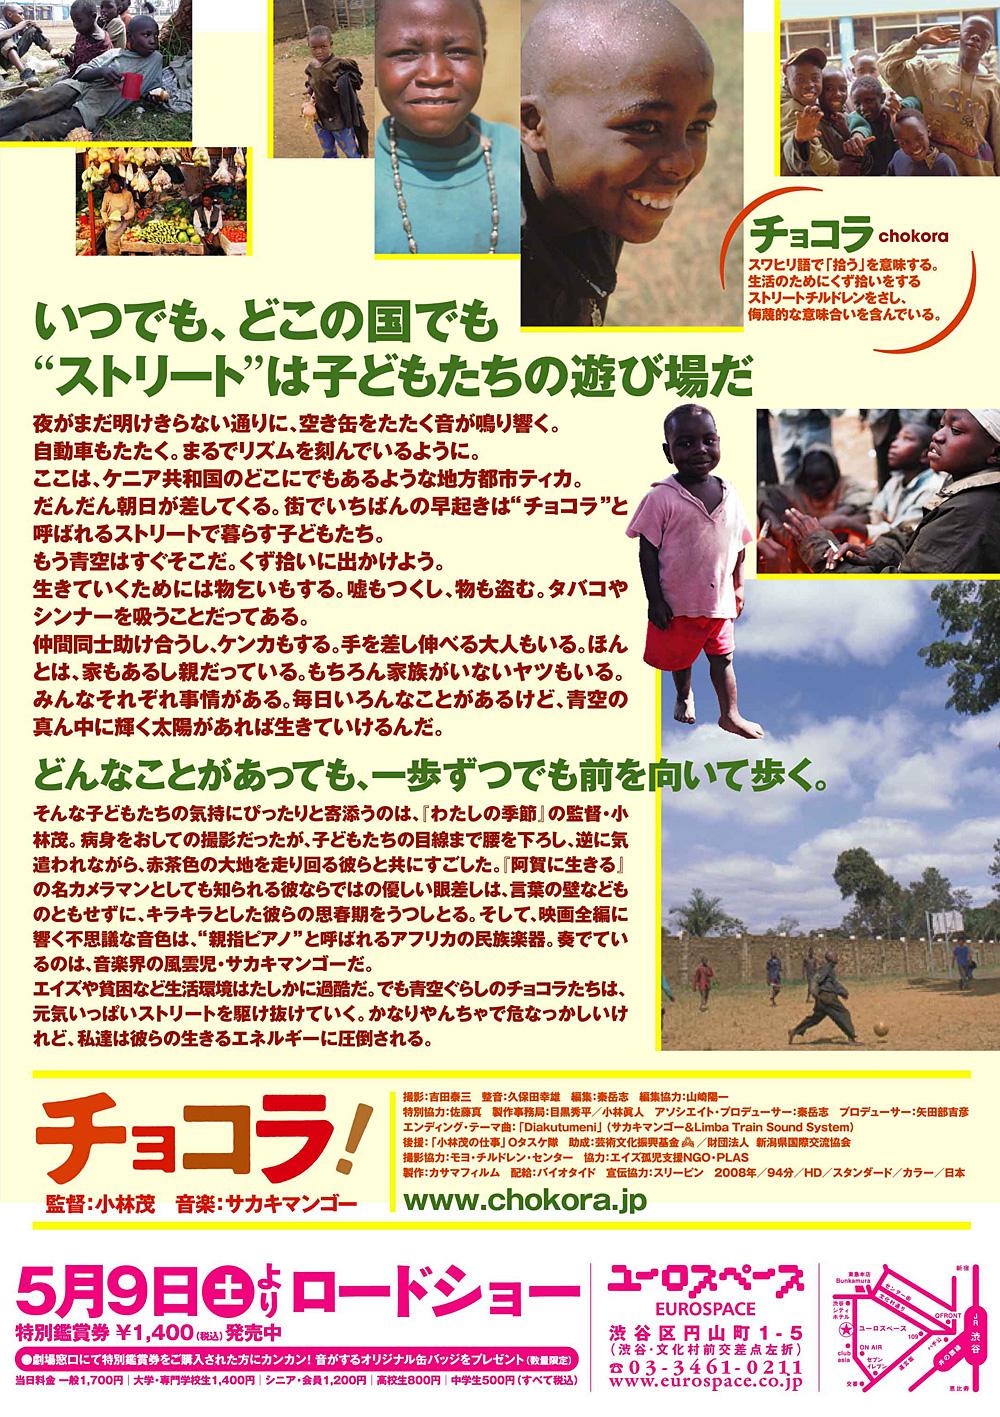 http://www.chokora.jp/images/chokora-flyer01ura.jpg